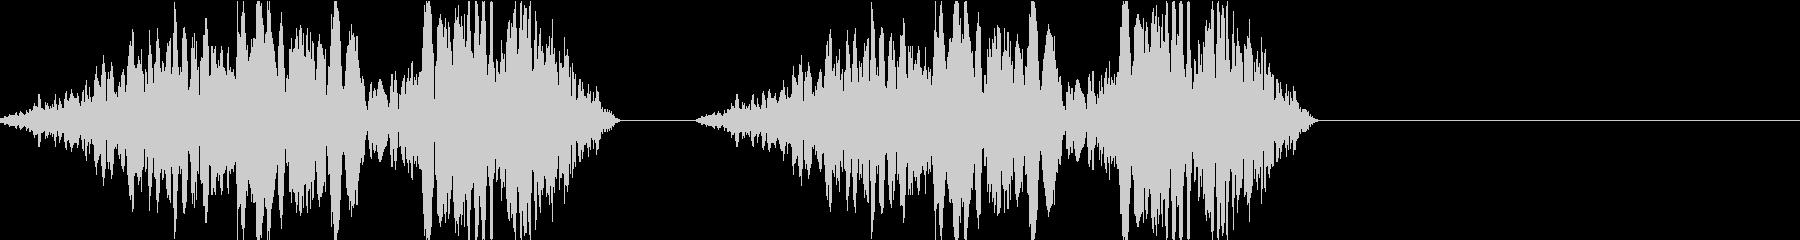 DJプレイ スクラッチ・ノイズ 198の未再生の波形